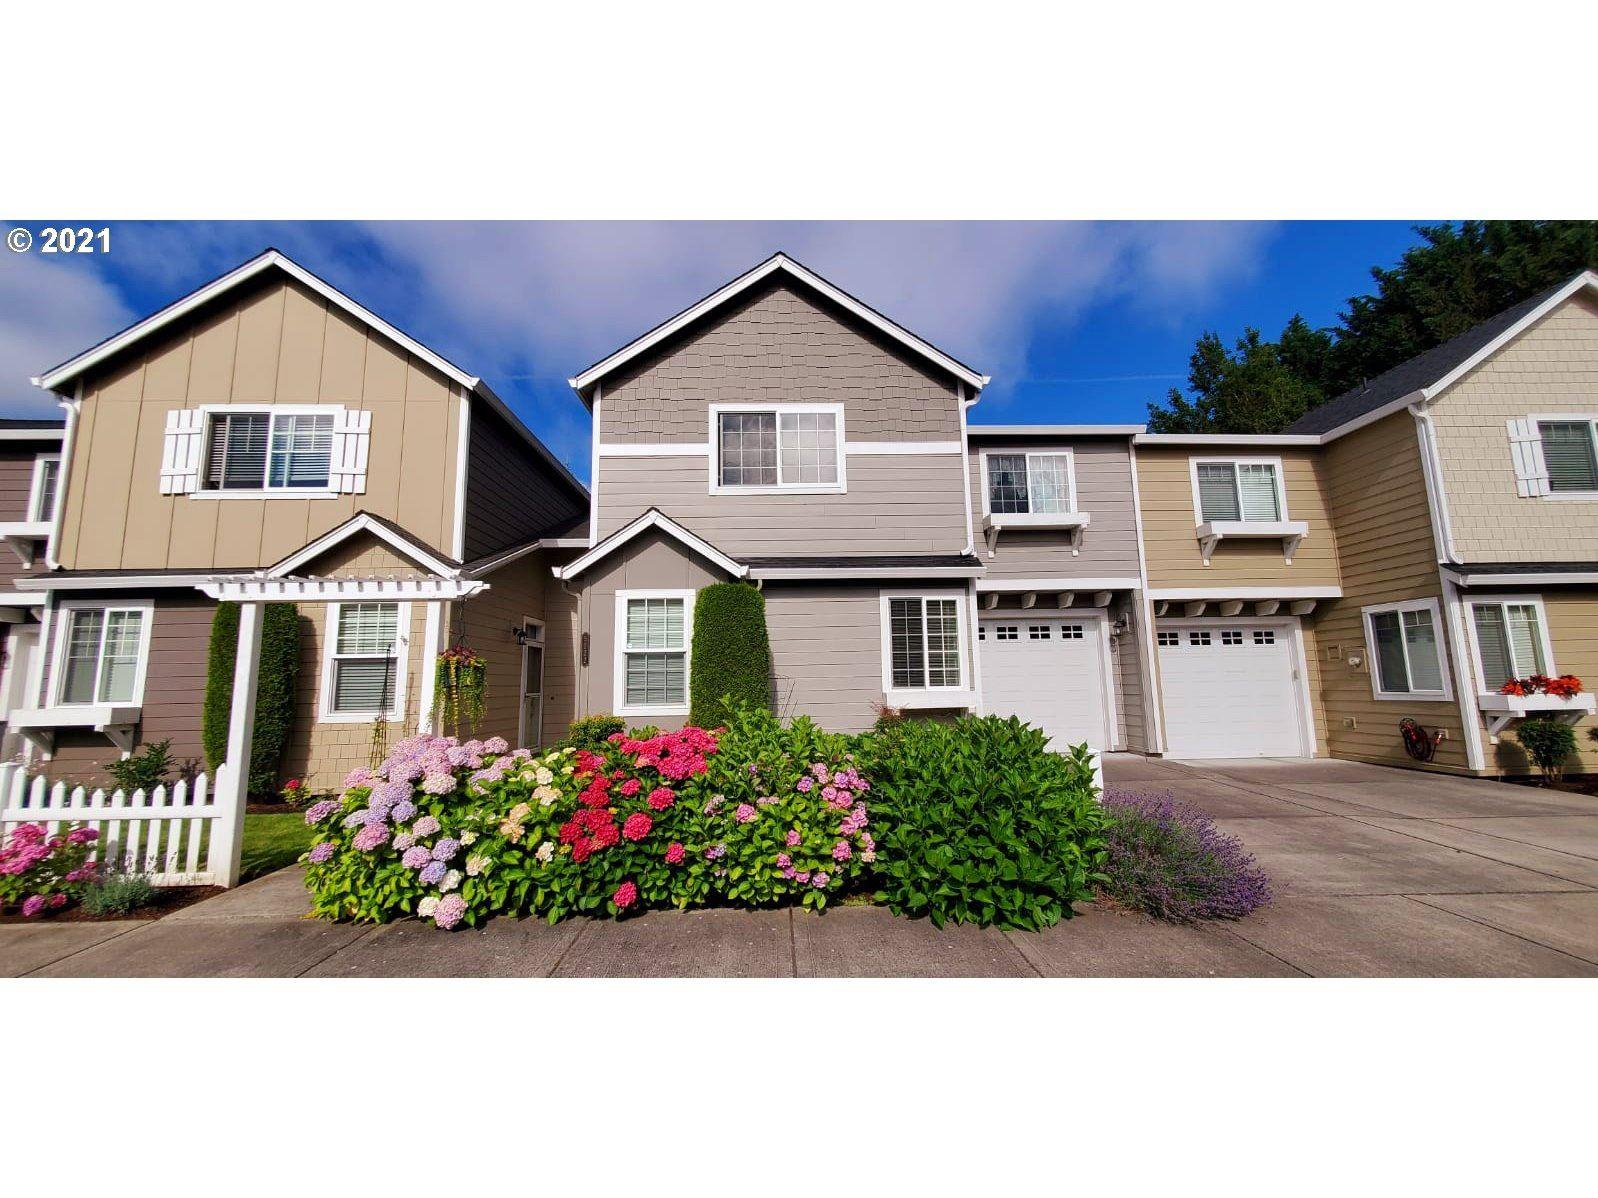 5222 NE 74TH CT, Vancouver, WA 98662 - MLS#: 21462876